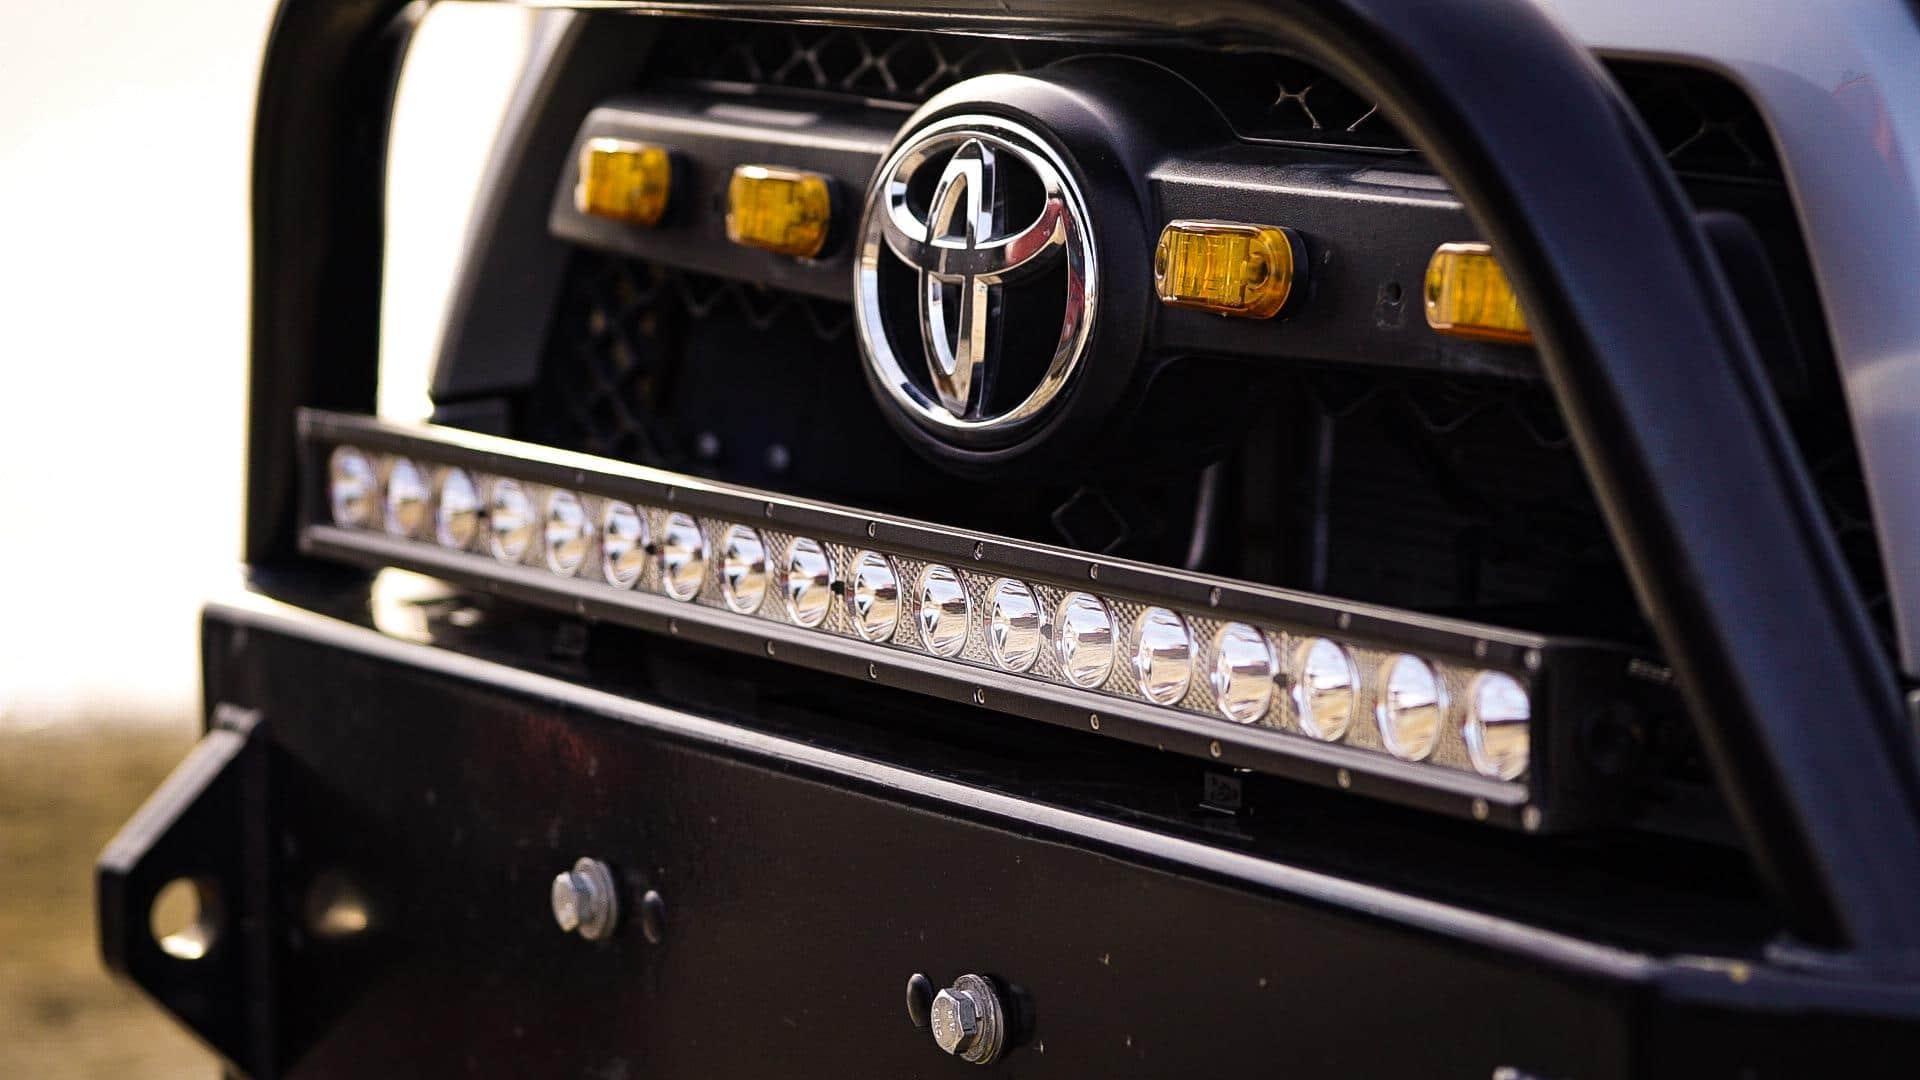 Xd Series 31 9 Quot 54w Single Row Led Light Bar Xds440 Hard Korr Usa